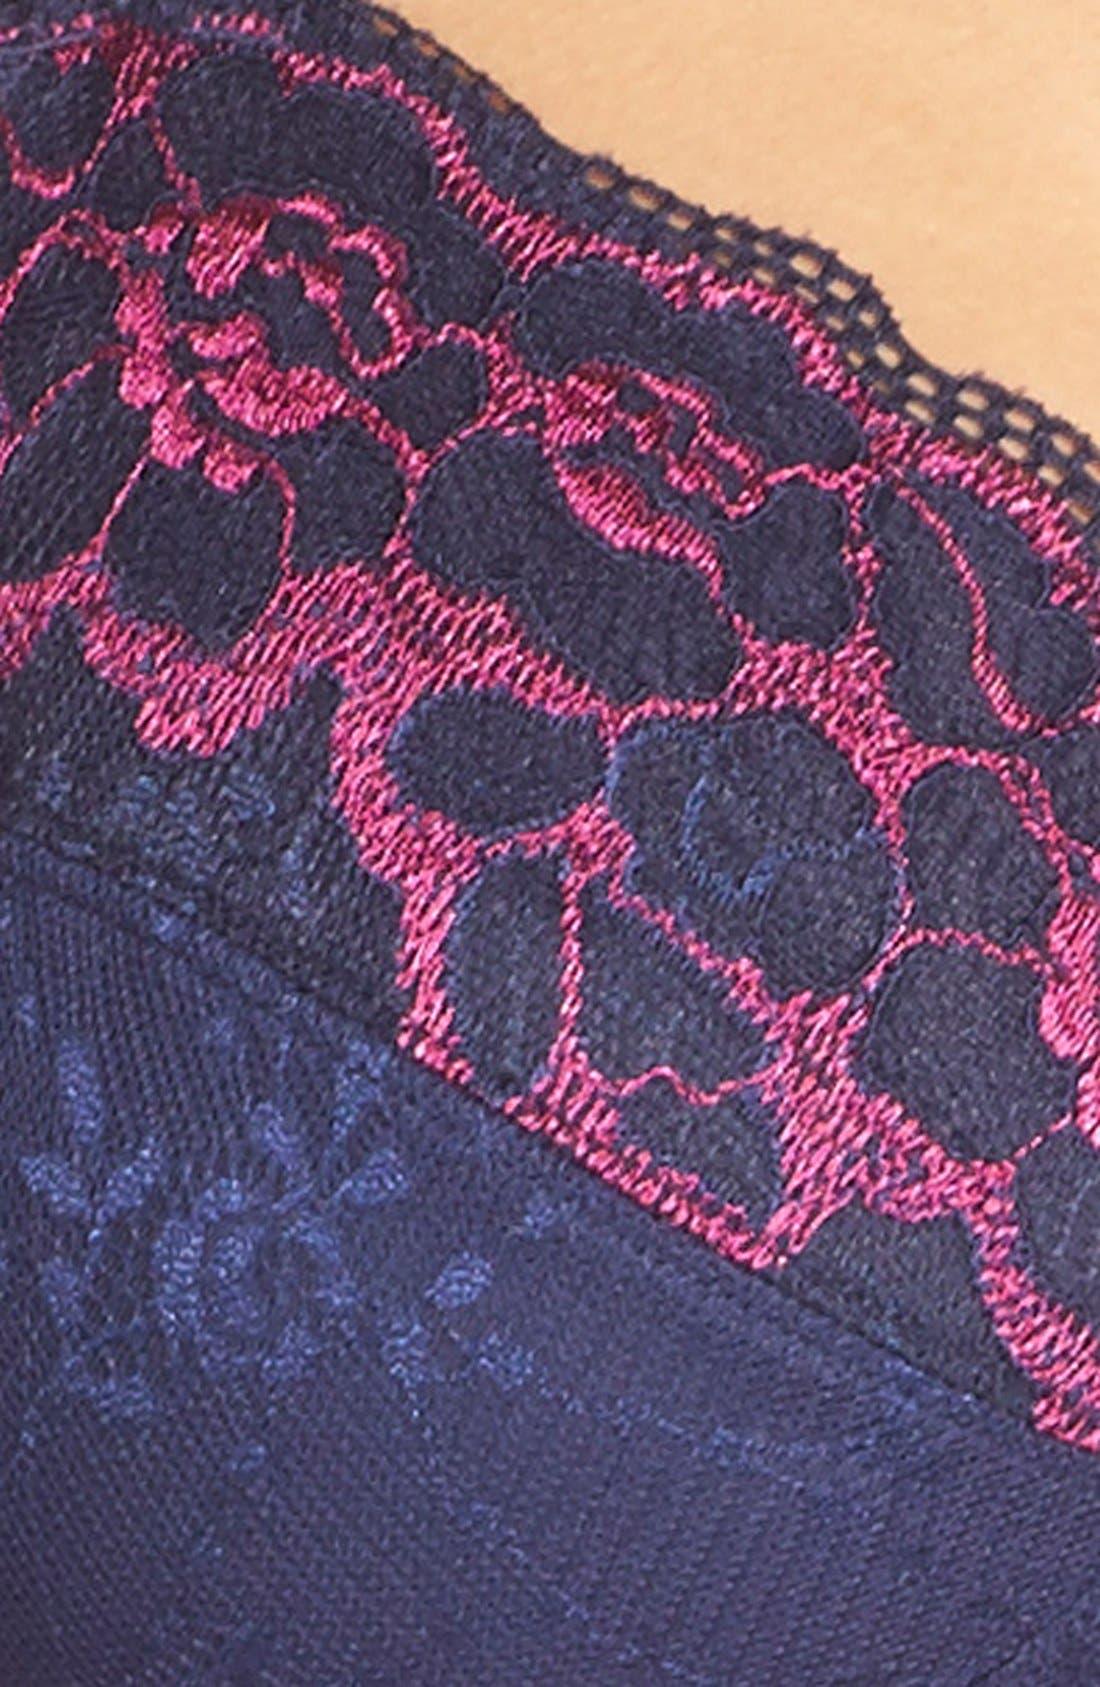 'Karla' Lace Soft Cup Bra,                             Alternate thumbnail 4, color,                             465